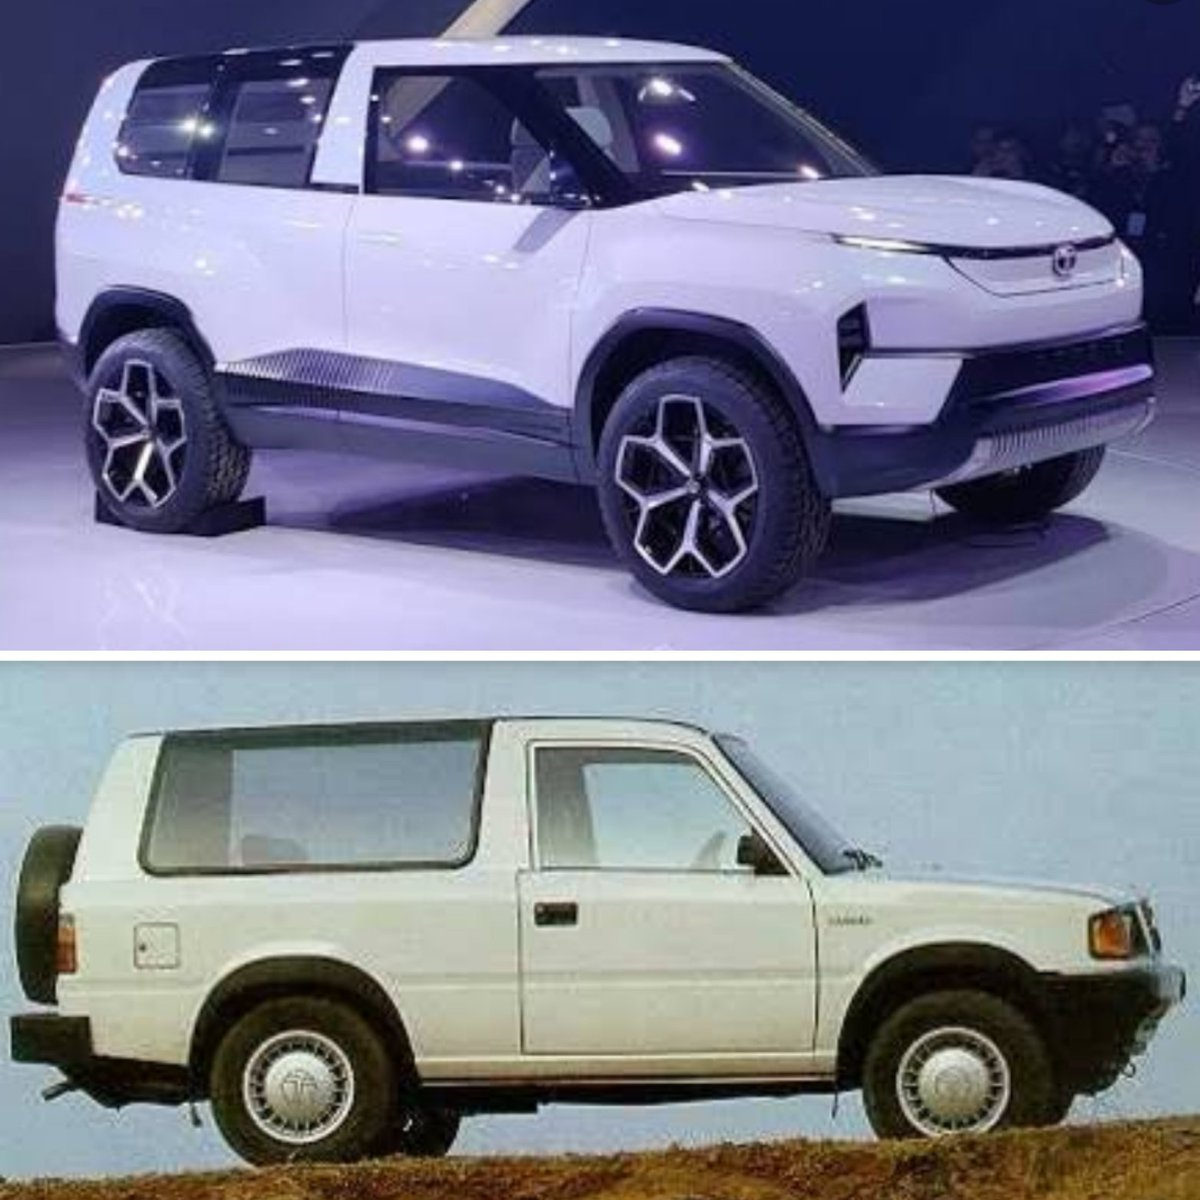 @BosePratap @TataMotors@TatamotorsEVI wish, my dream will come true.I request, I hope, I feel #Tatamotors will bring concept #TataSierra into REALITY...@BosePratap shall I dream of having both in my collection...?